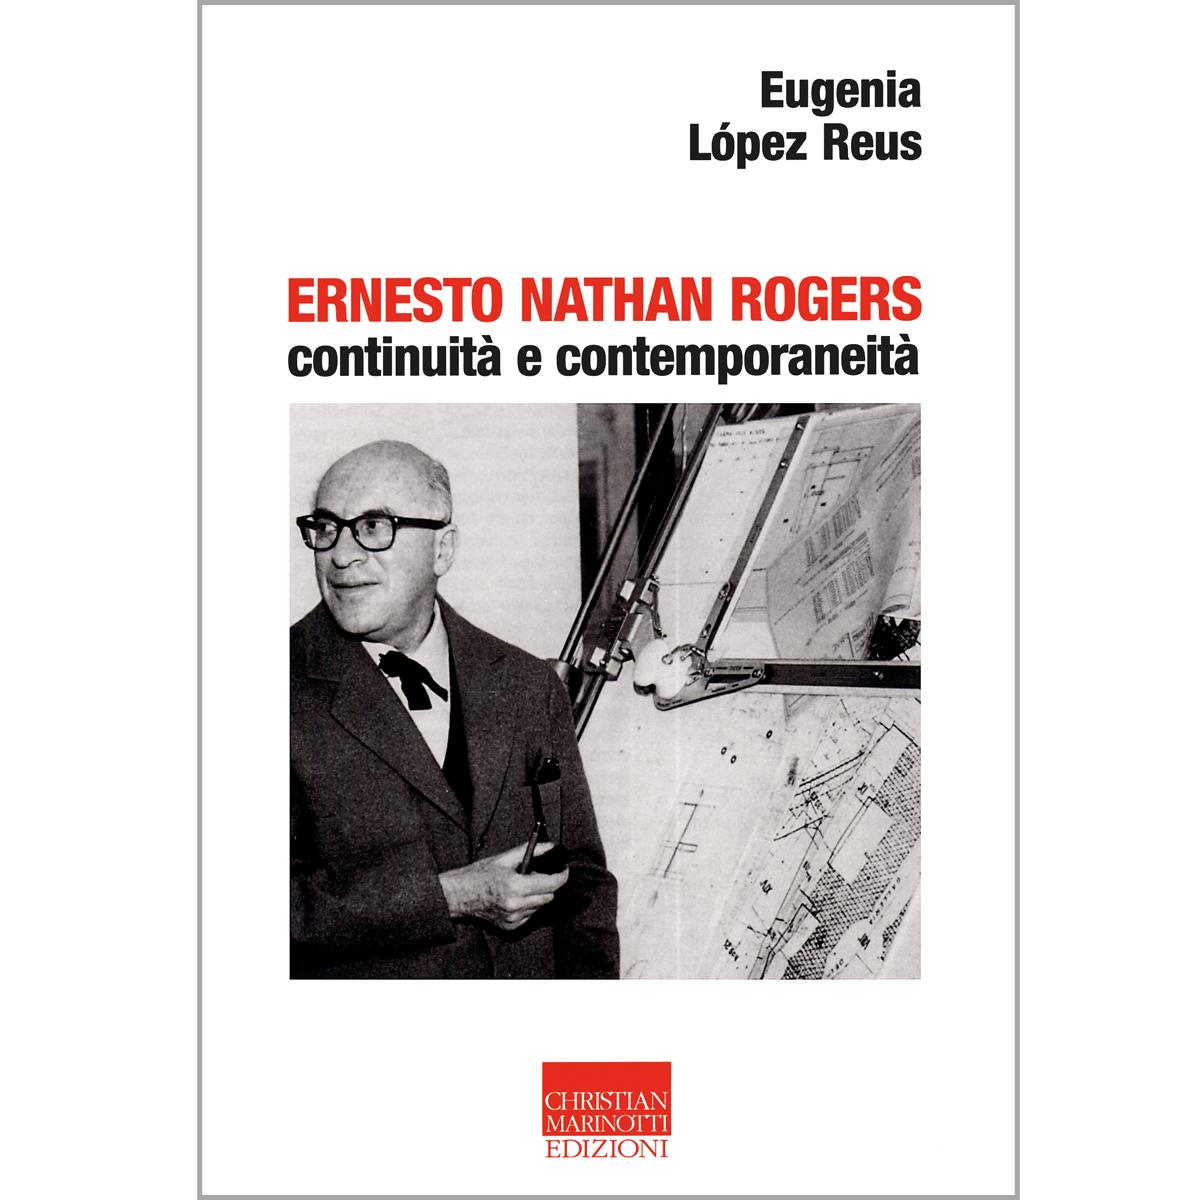 Ernesto Nathan Rogers